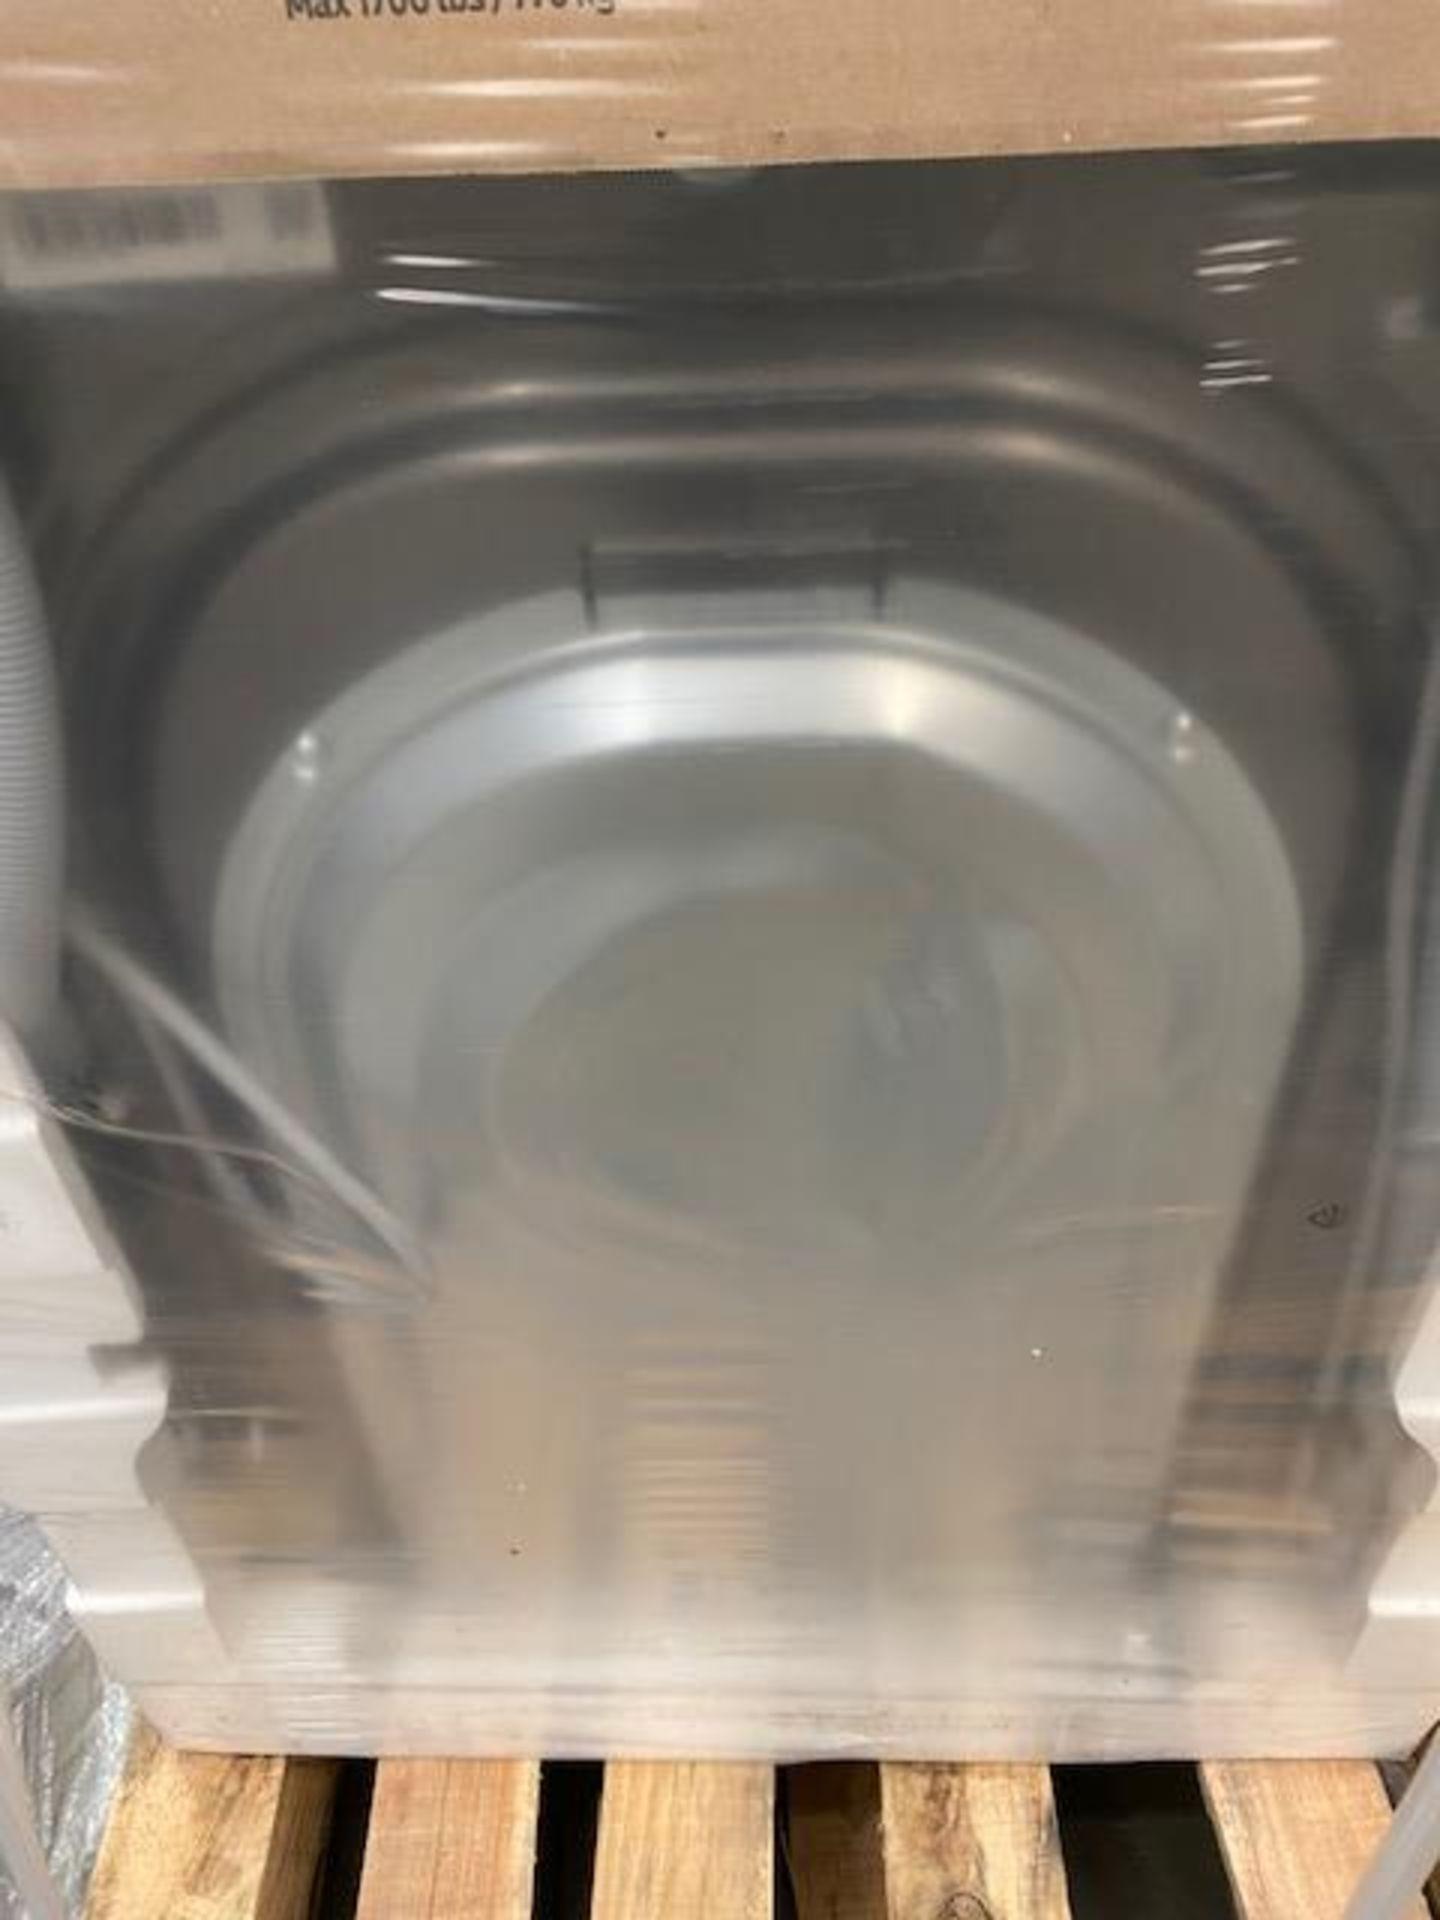 Pallet of 1 Samsung Premium Washing machine. Latest selling price £339* - Image 7 of 8